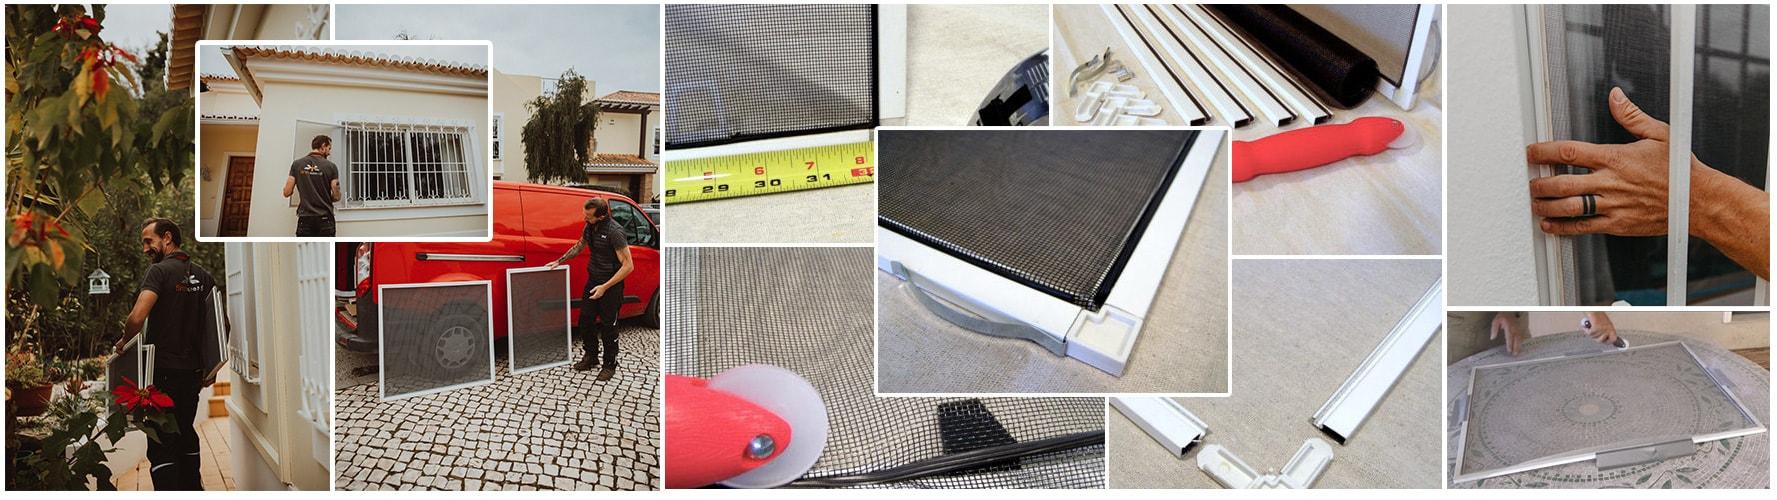 Flat sliding screens maintenance re-mesh / repair service.